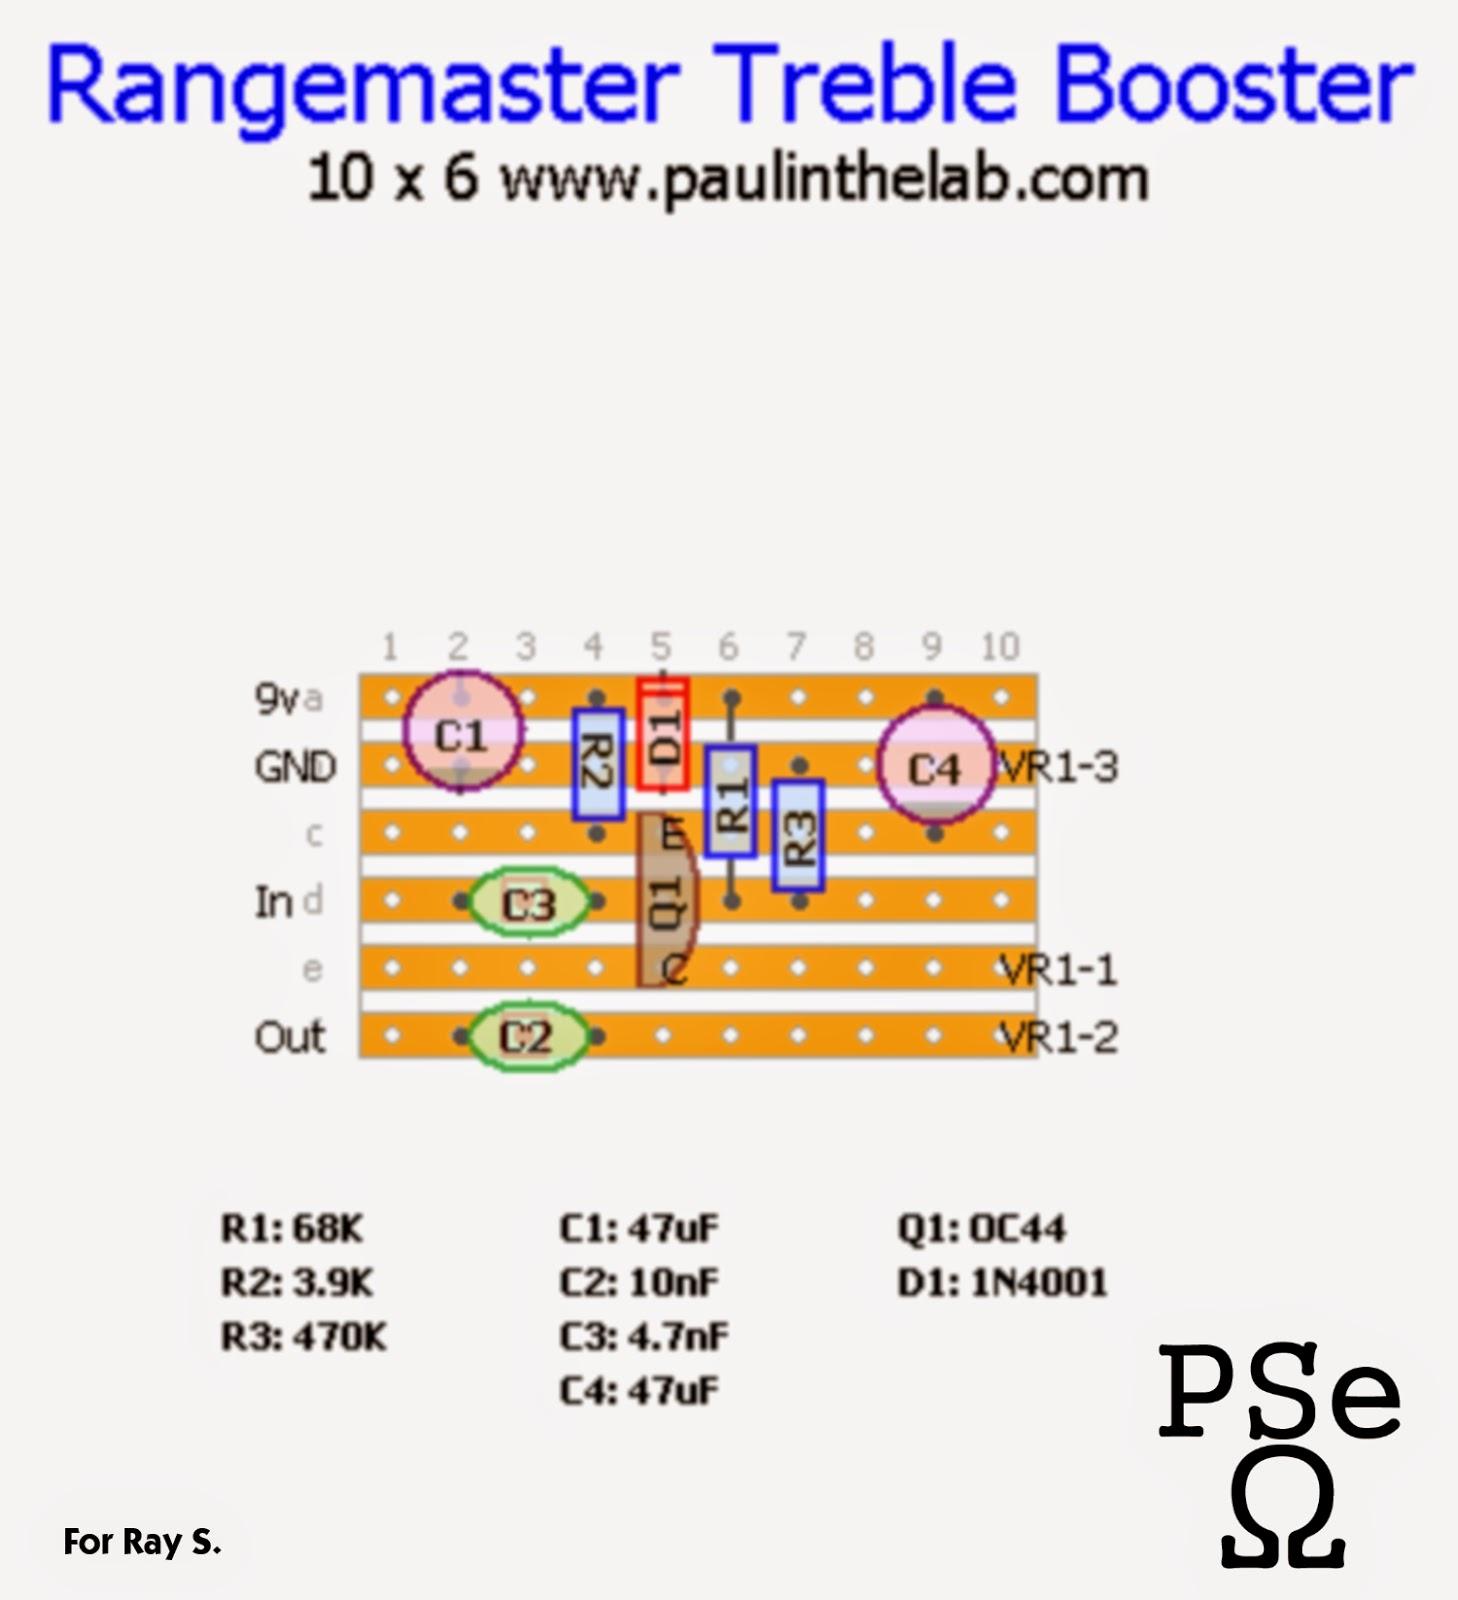 paul in the lab dallas rangemaster treble booster stripboard rh paulinthelab blogspot com